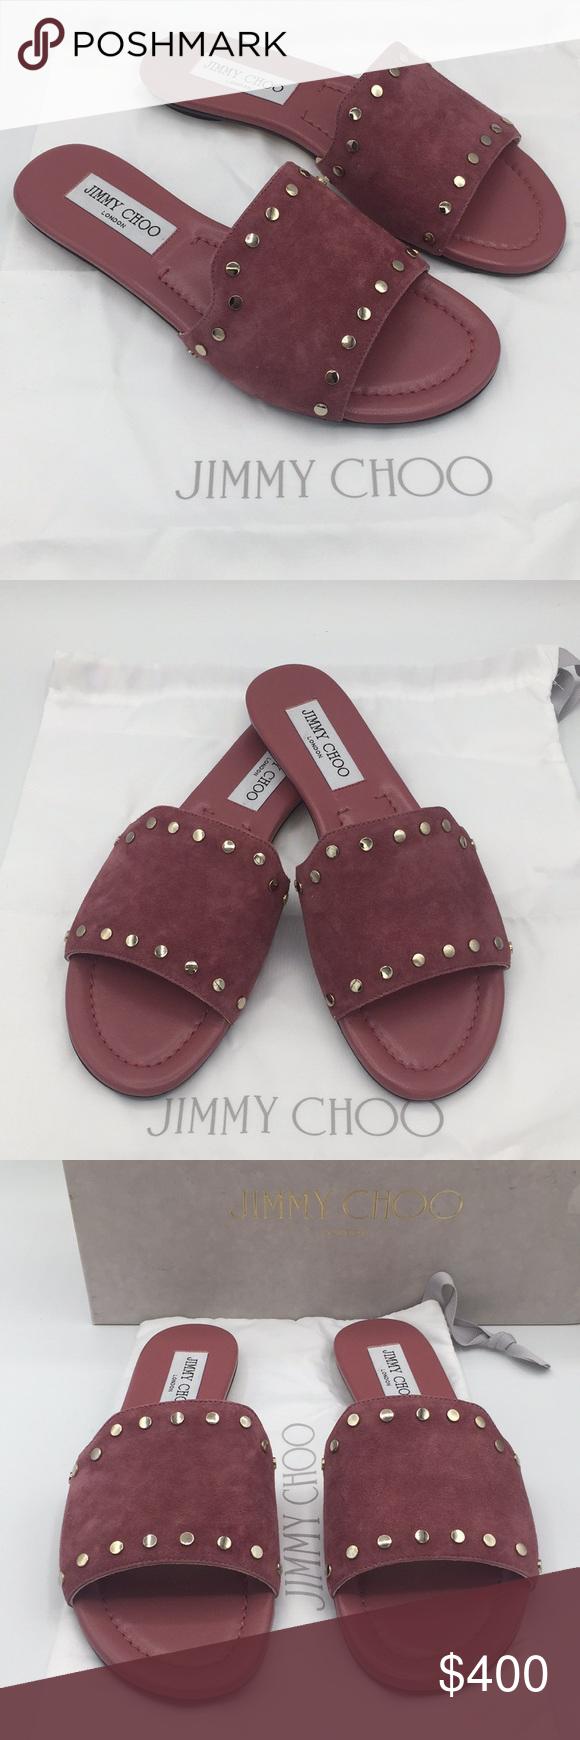 8851991030c Jimmy Choo Nanda Suede Flat Slide Sandals Jimmy Choo Nanda Vintage Rose Gold  Jimmy Choo